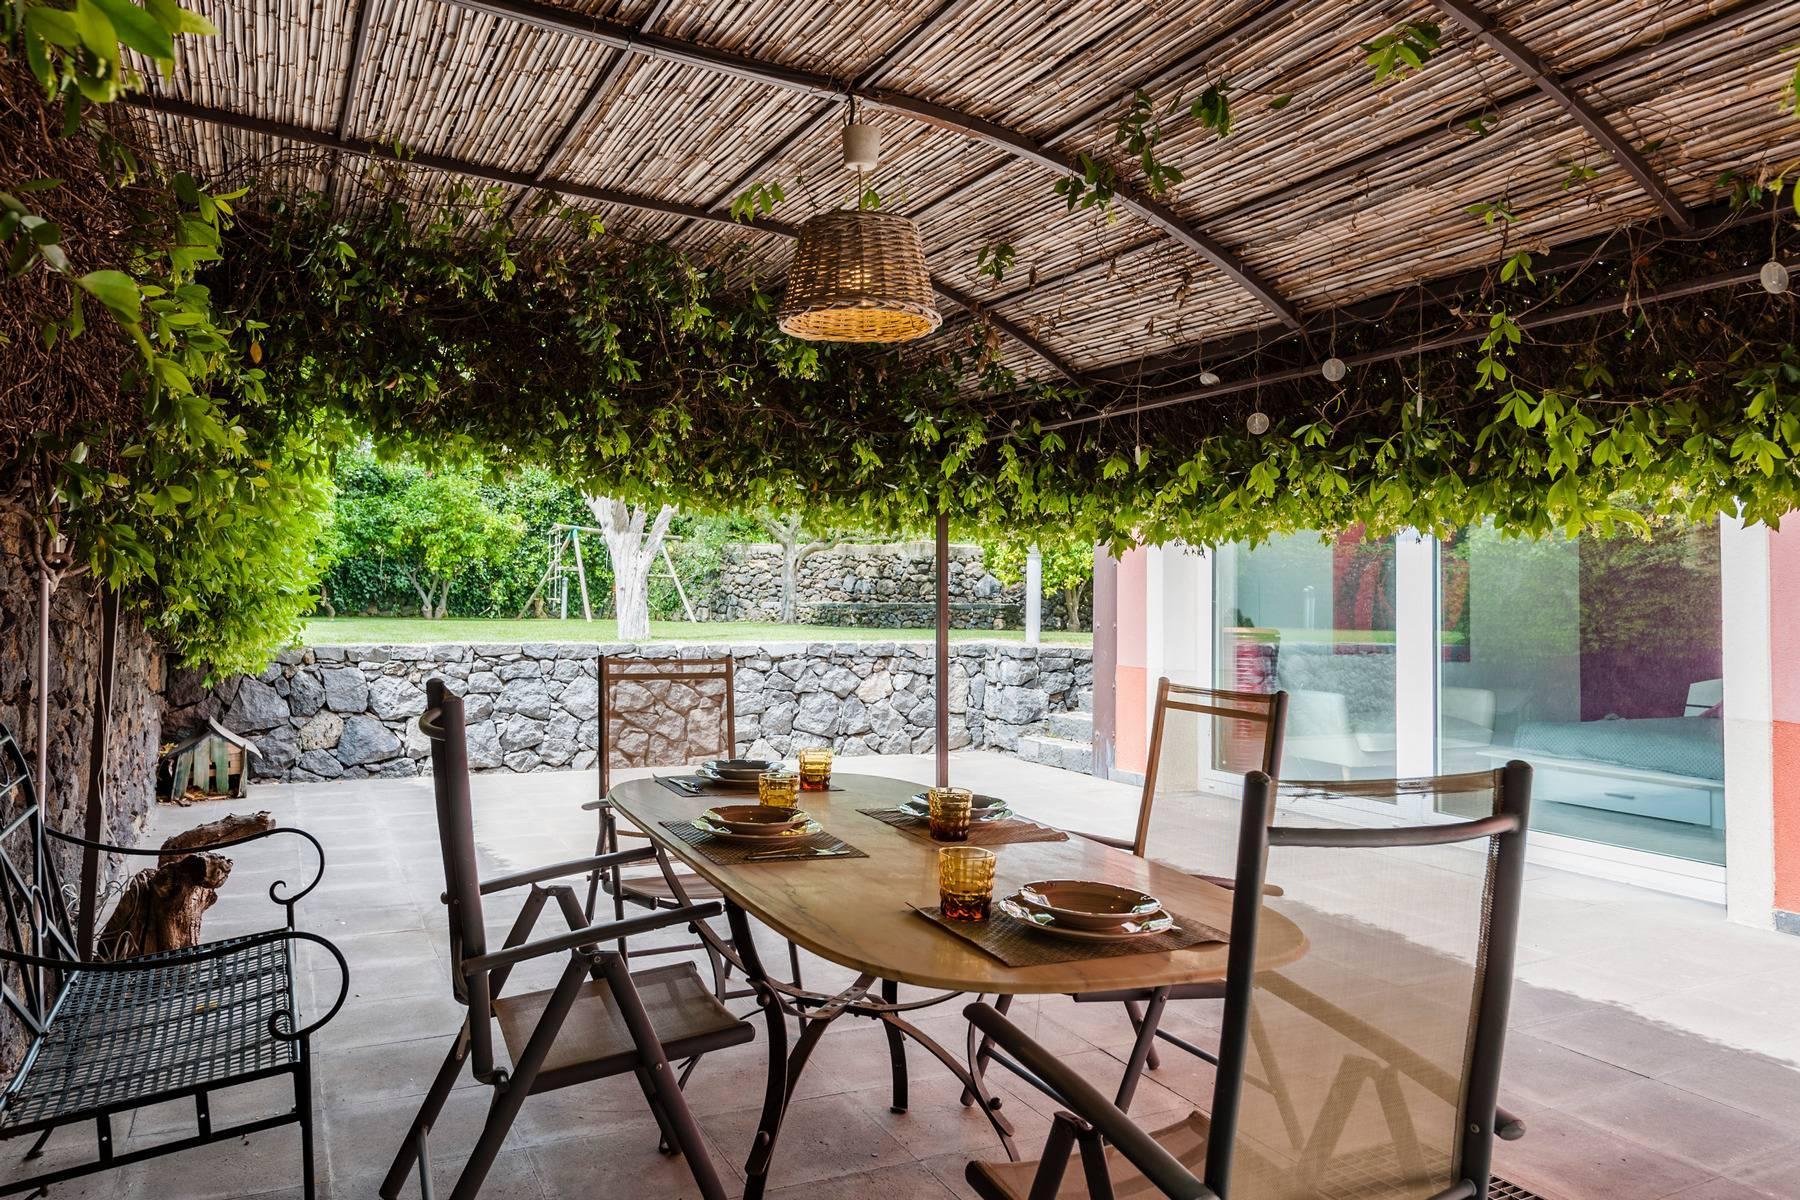 Villa esclusiva con piscina con vista ad Acireale - 5